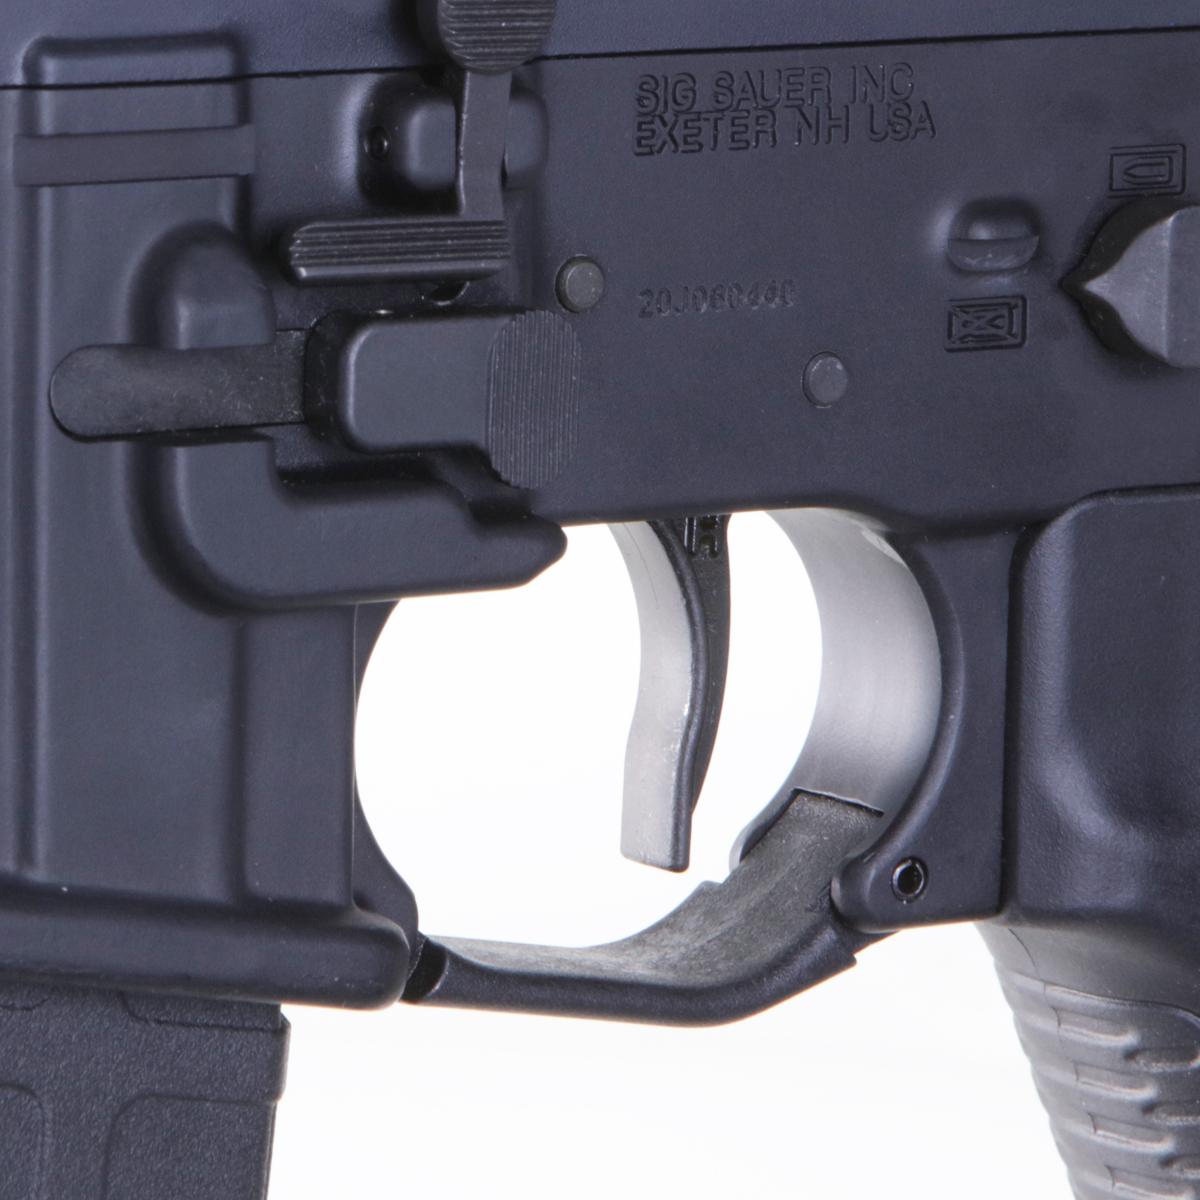 SIG Sauer M400 Tread - Ambidextrous Controls